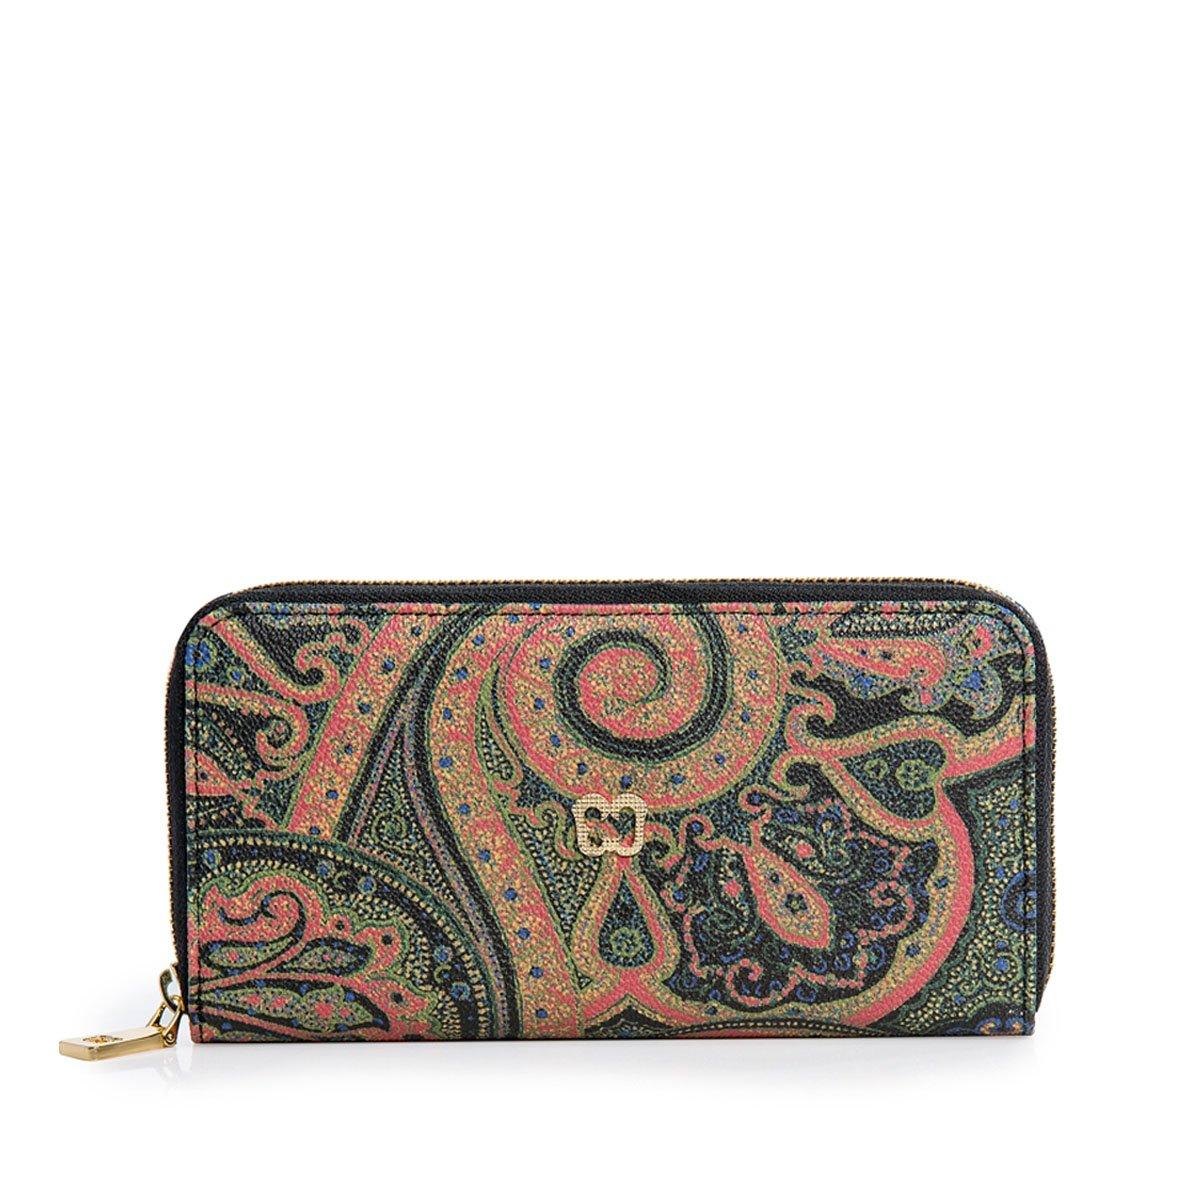 Eric Javits Luxury Fashion Designer Women's Handbag - Zip Wallet - Persia